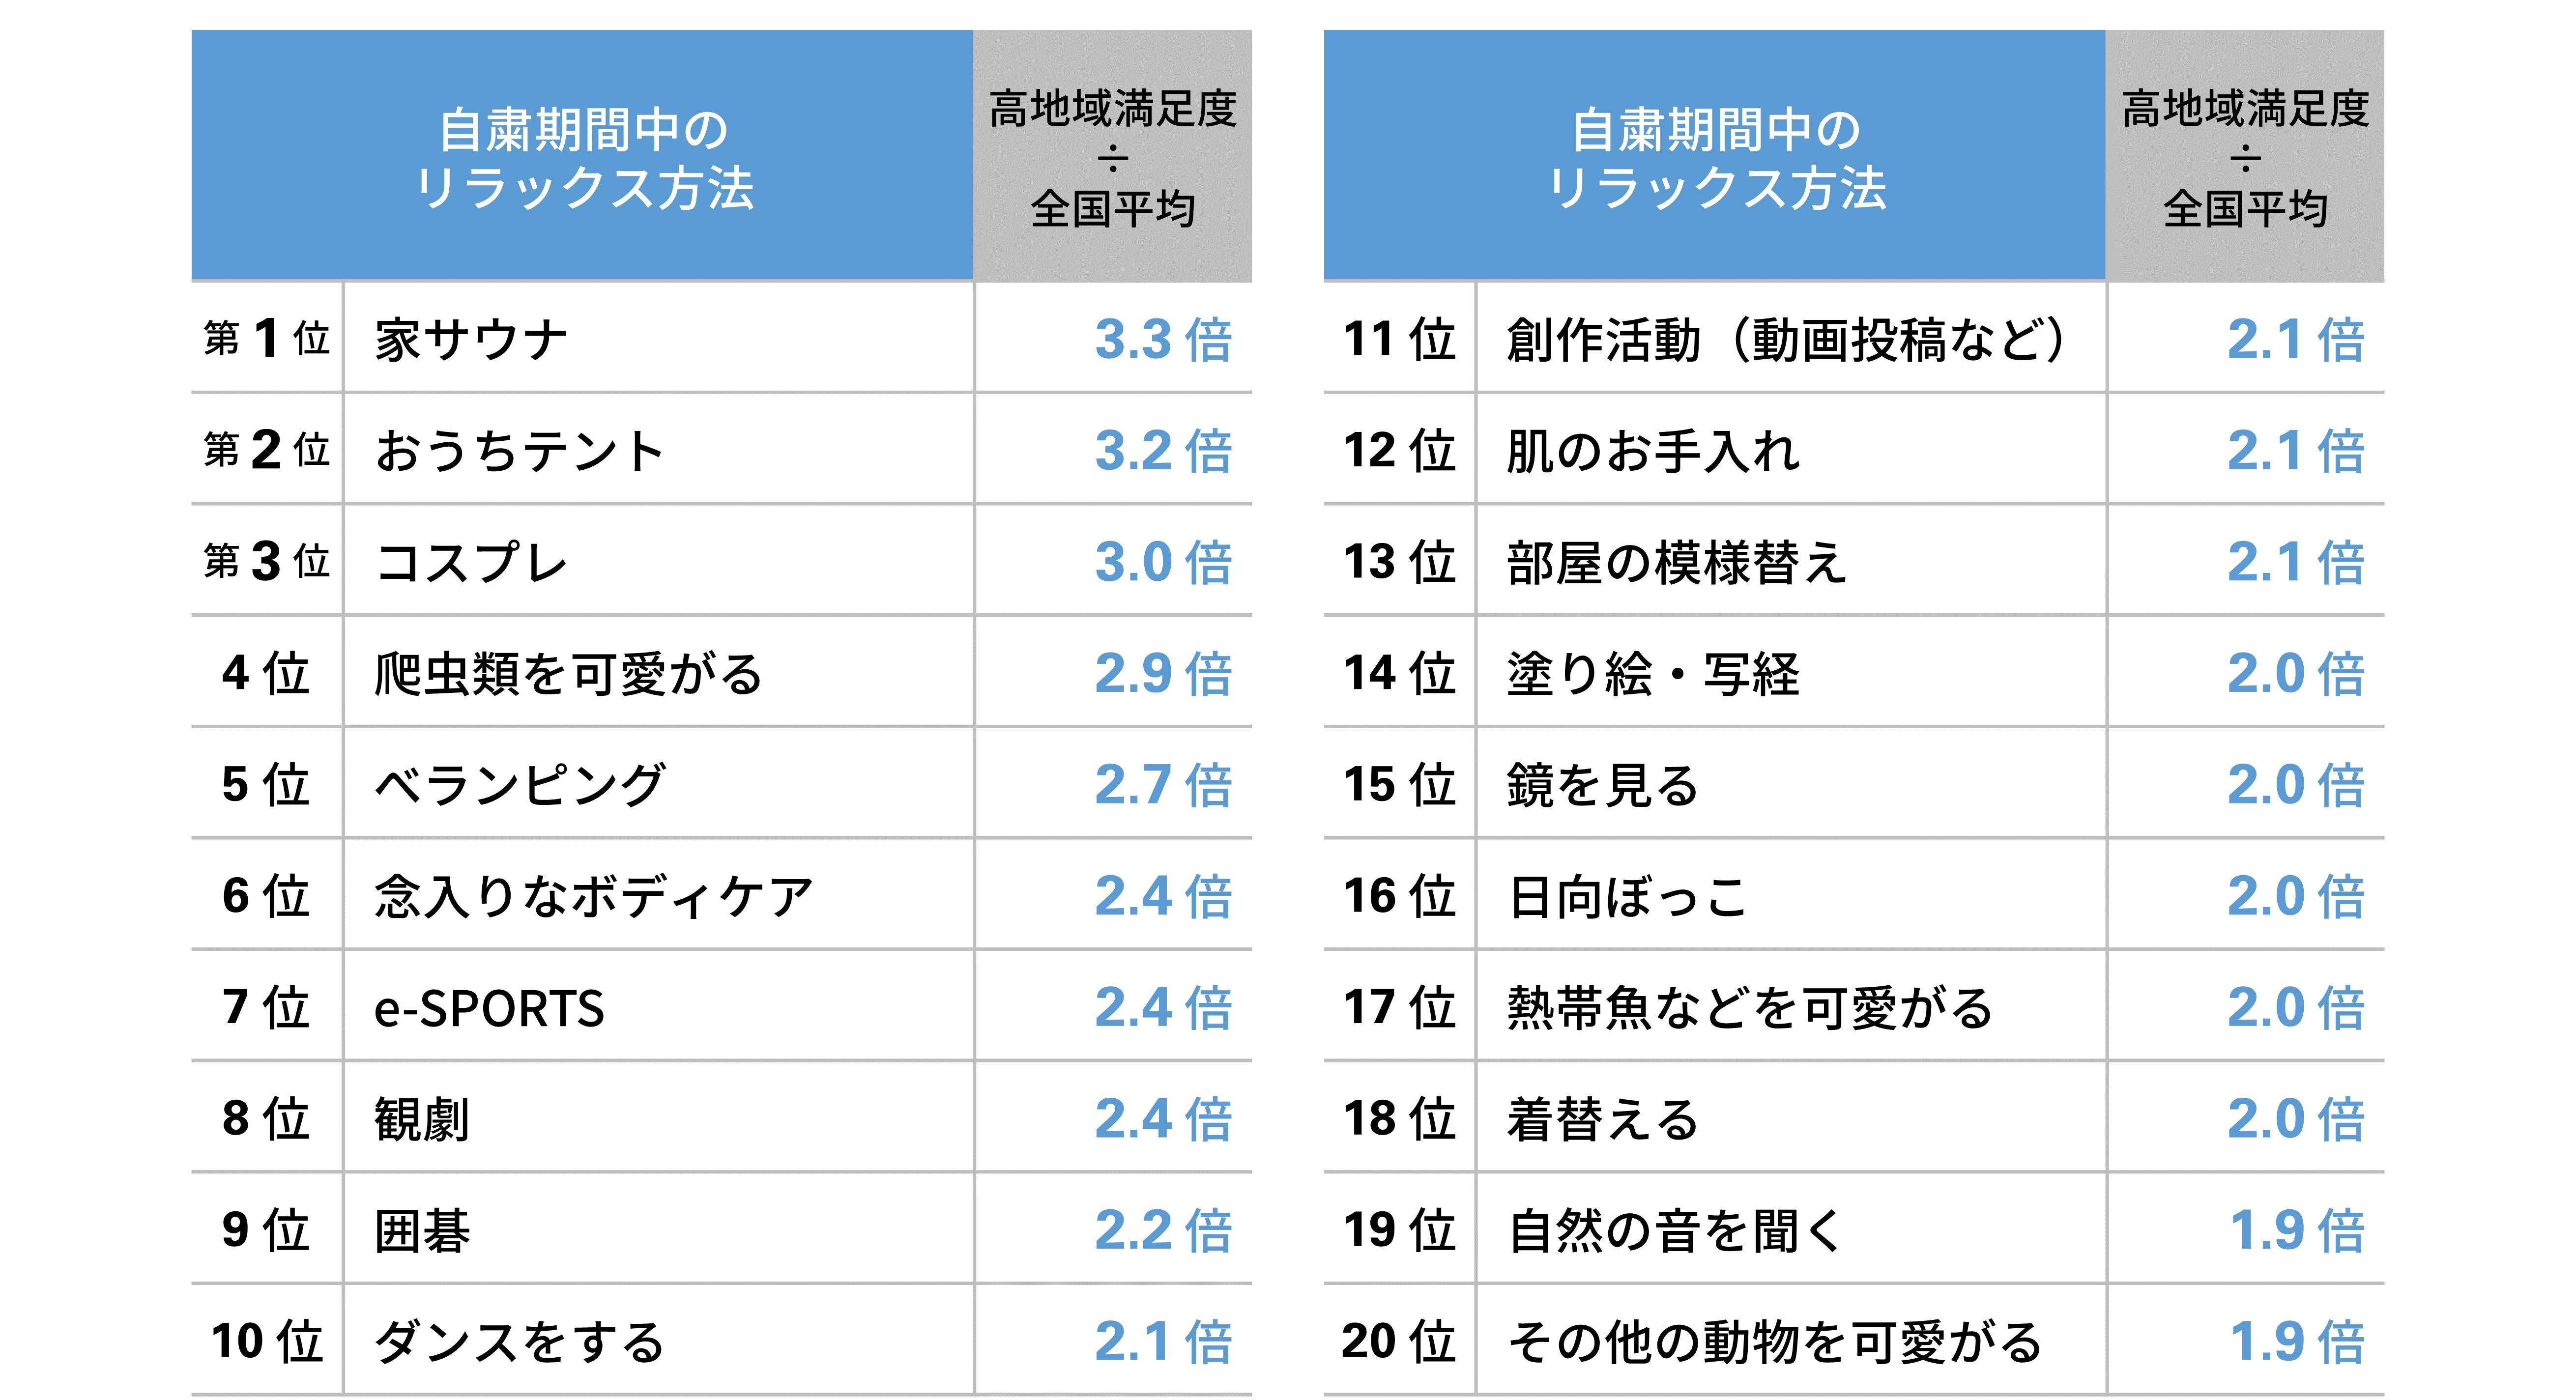 201001_04.jpg (1.28 MB)